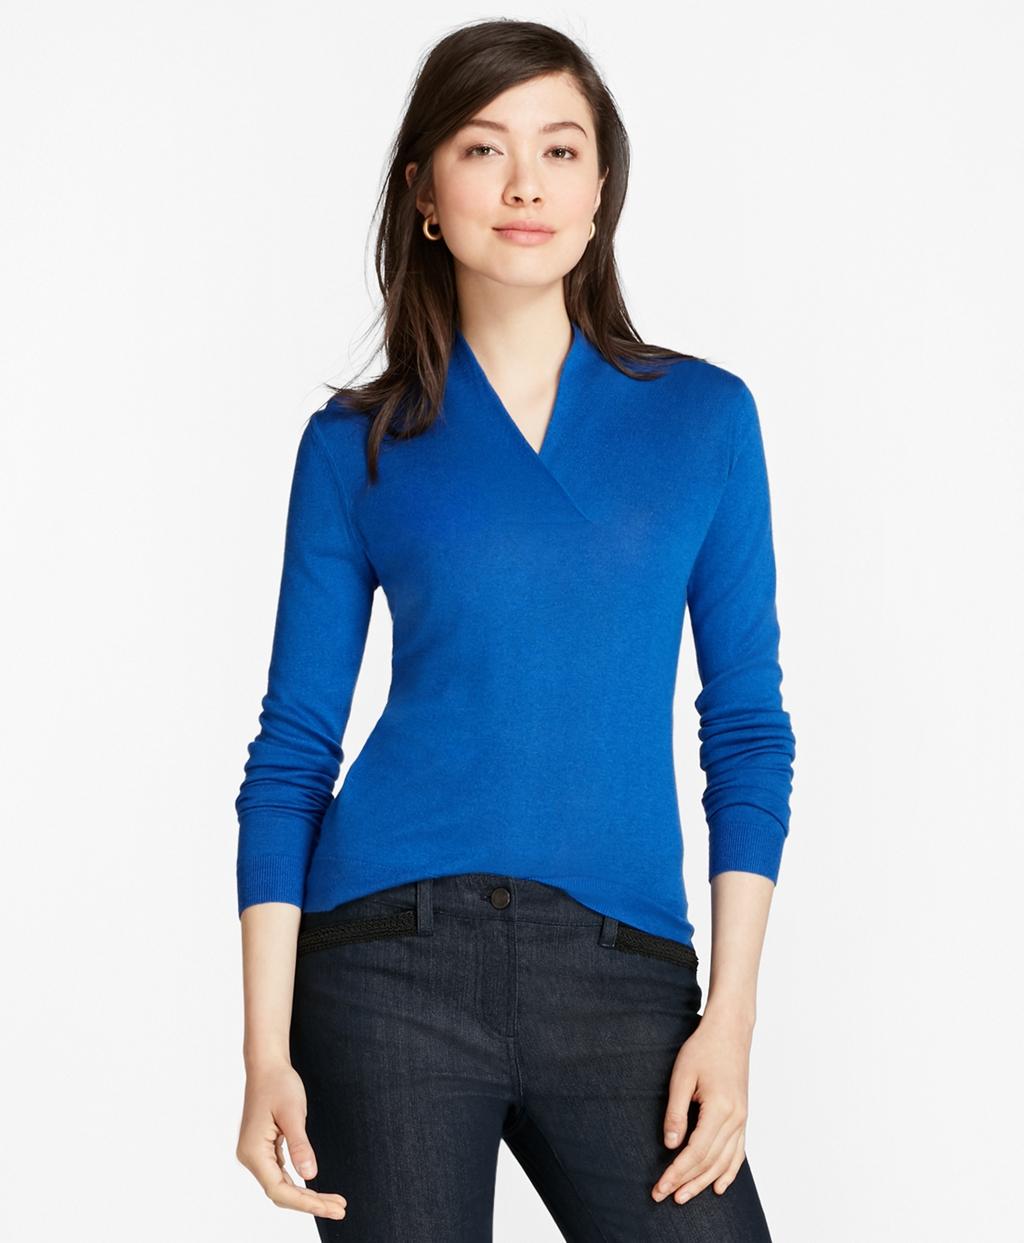 084cc8539 Silk-Cashmere Shawl-Collar Sweater - BB AU Ecommerce